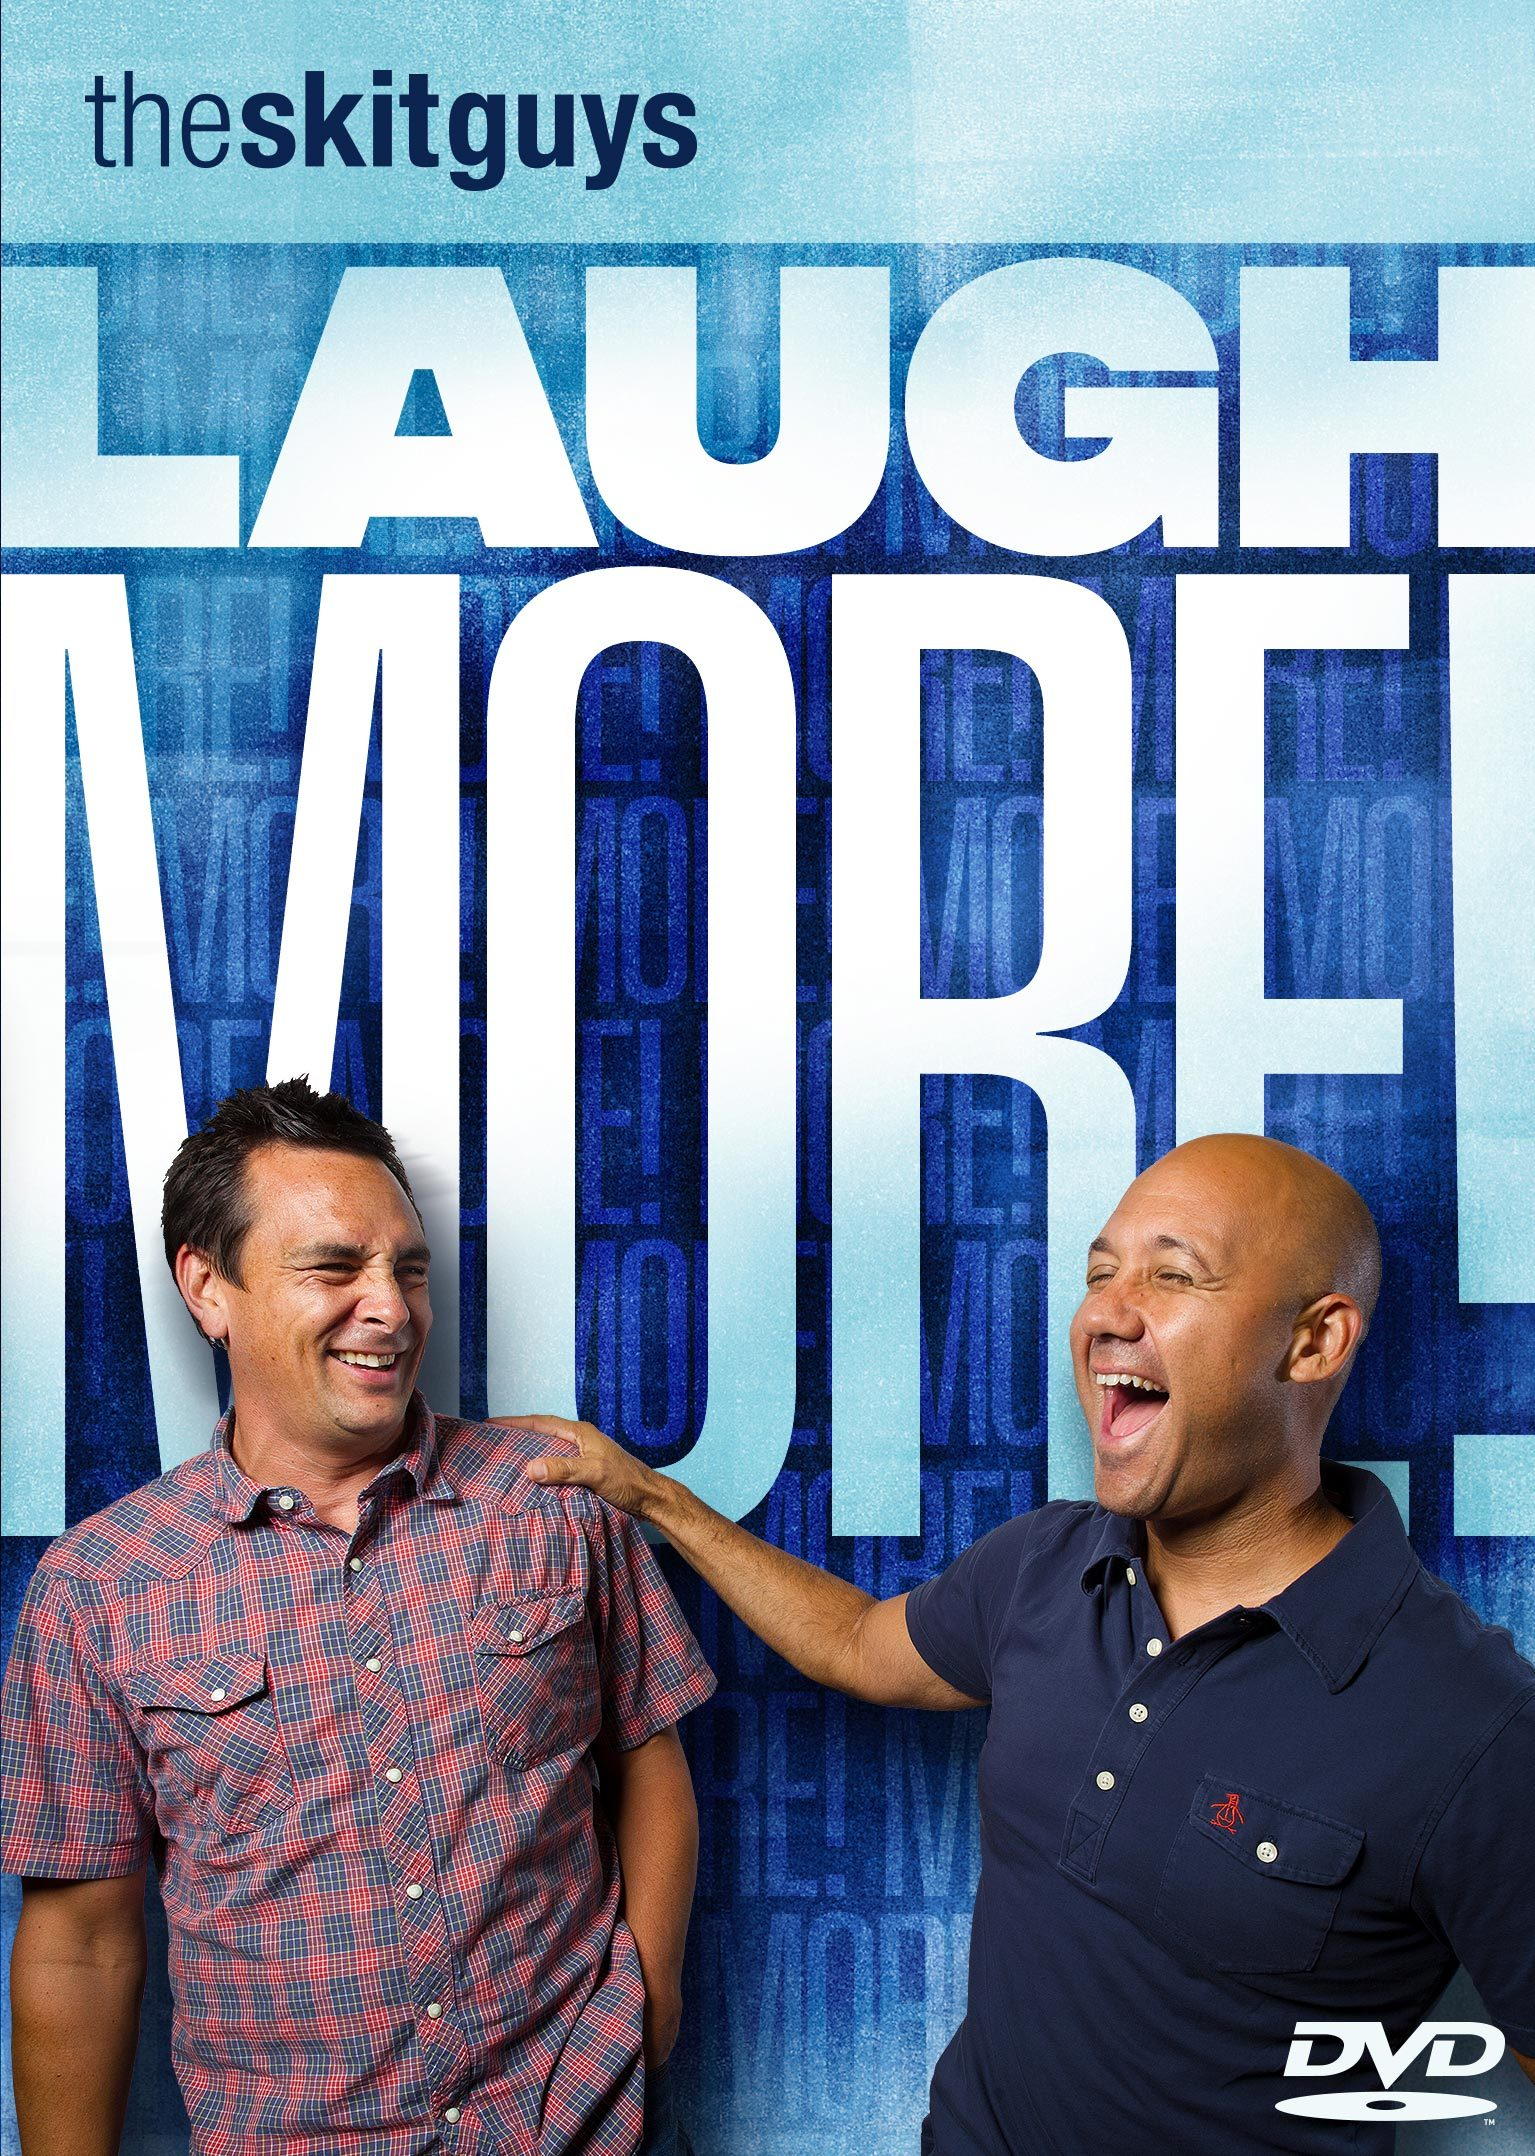 Laugh More! DVD Image